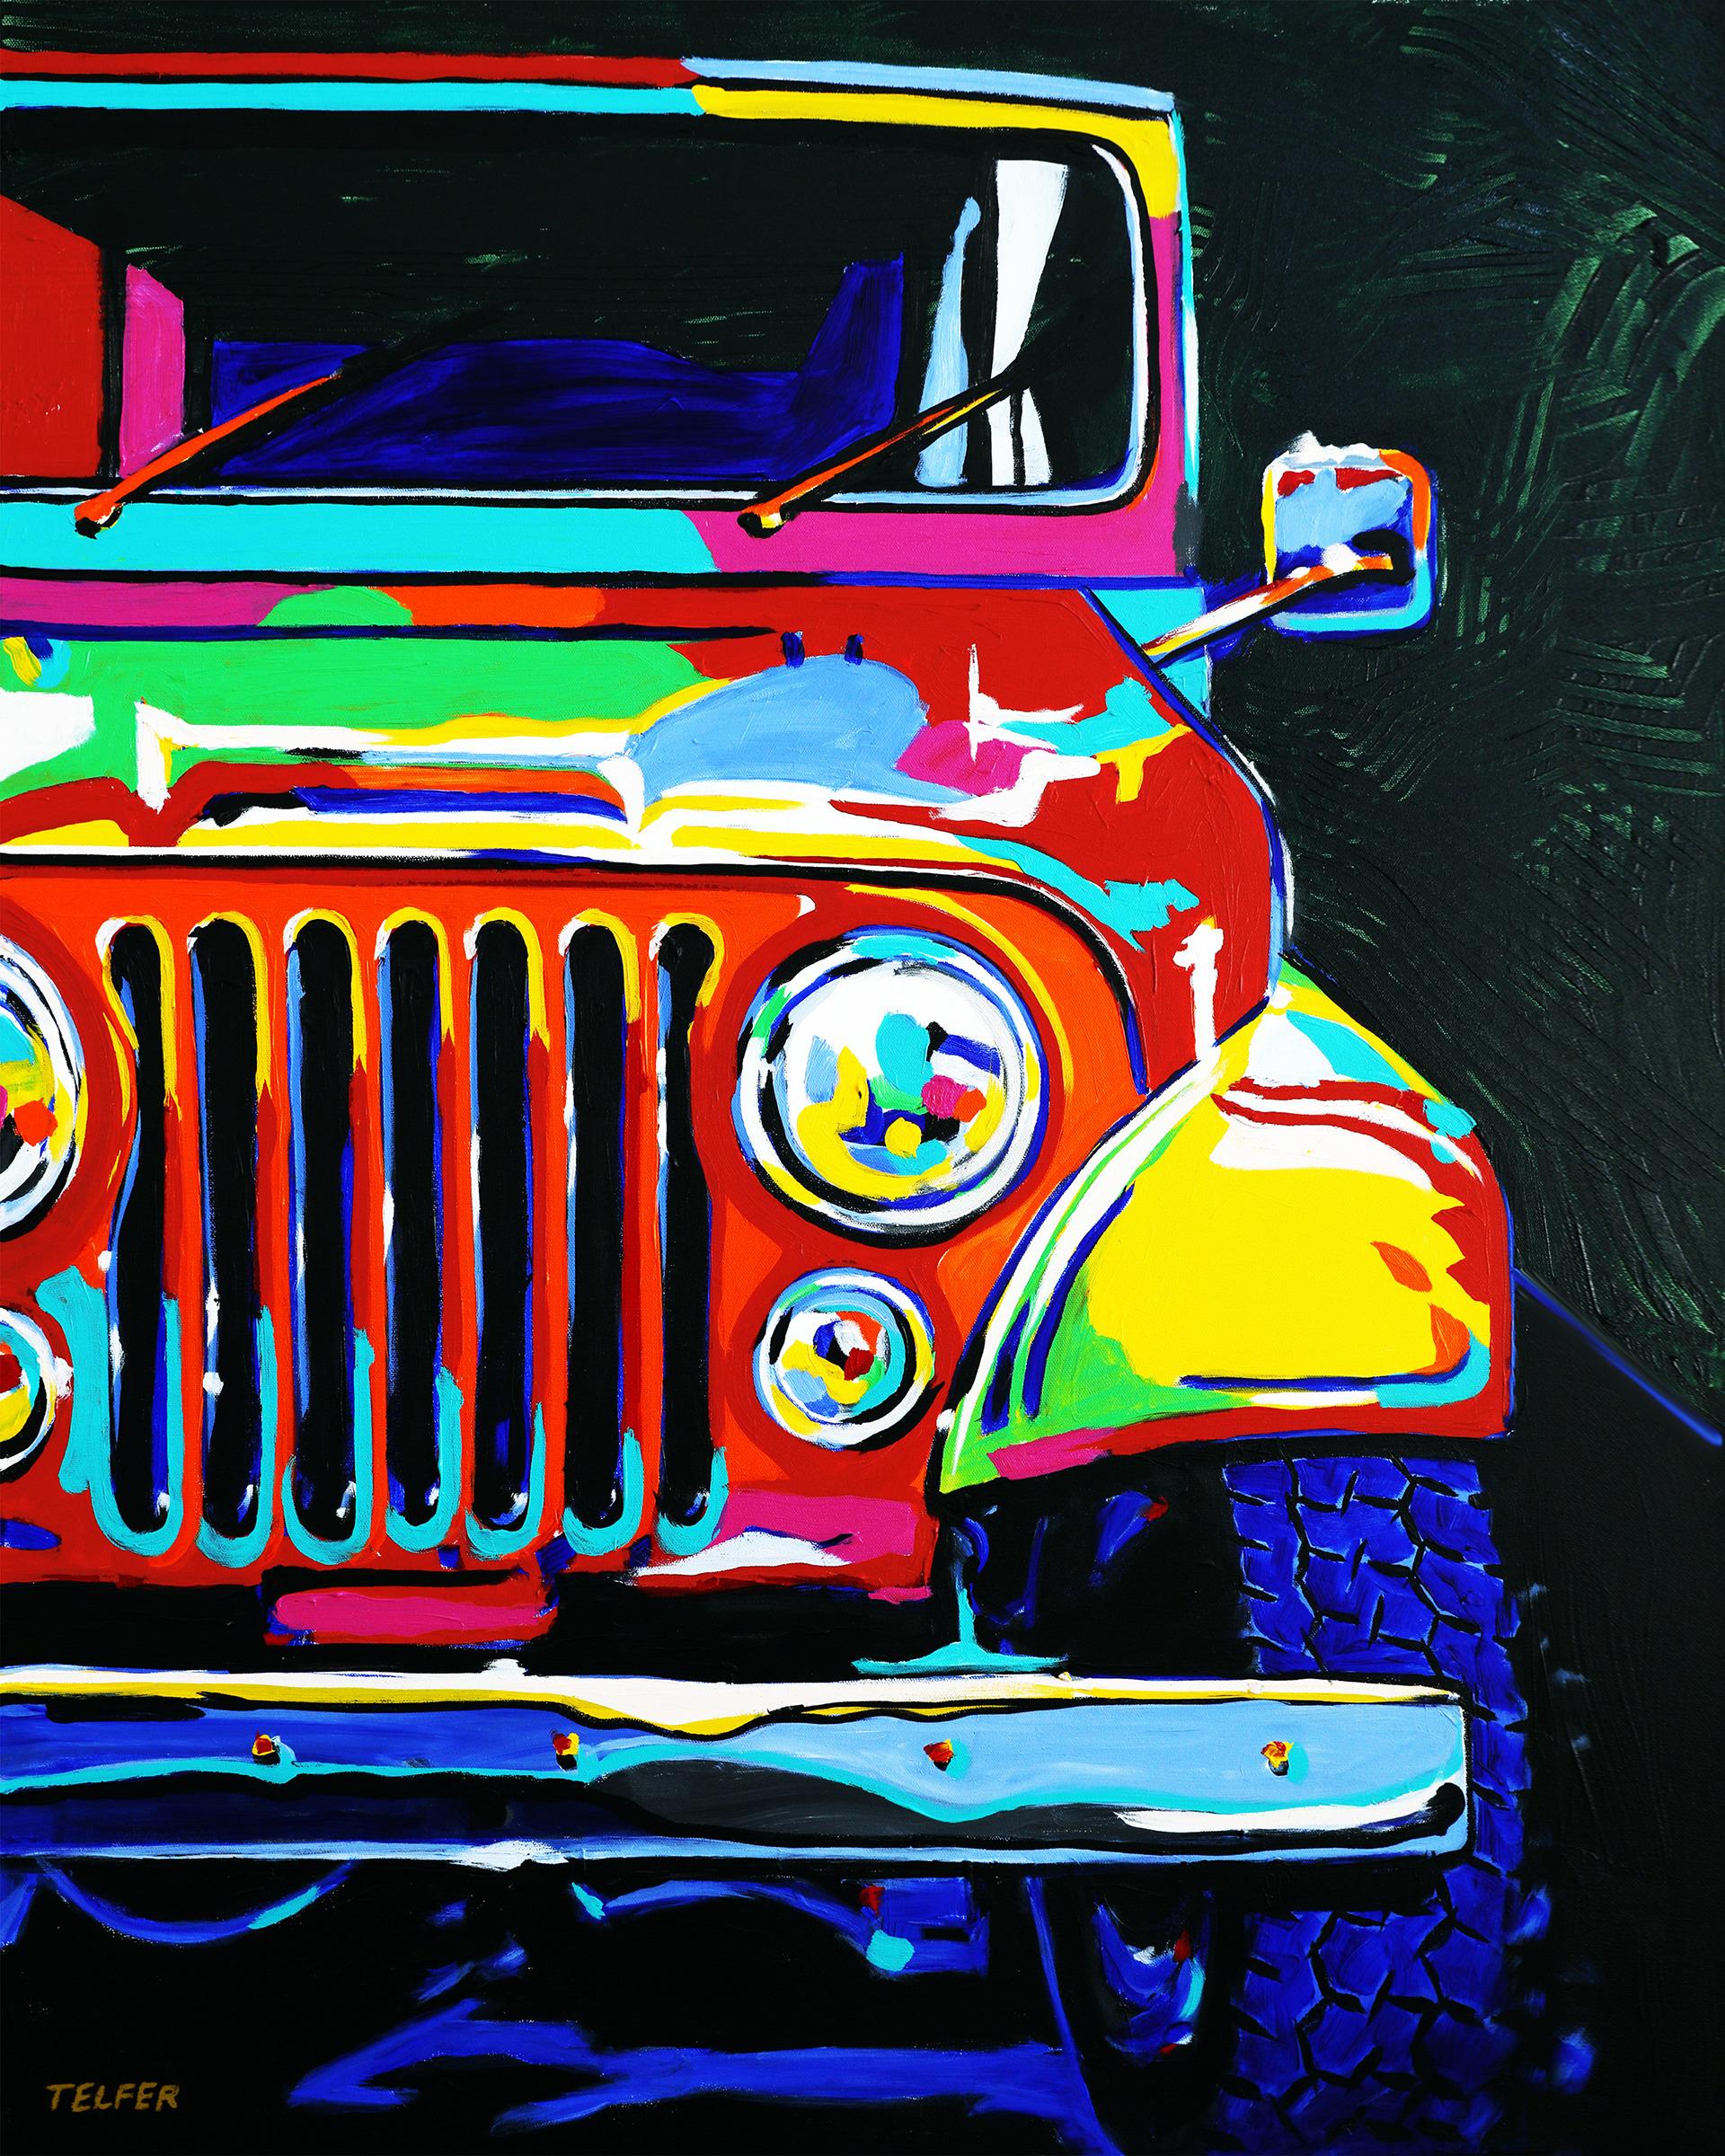 Jeep sm hgfdeu